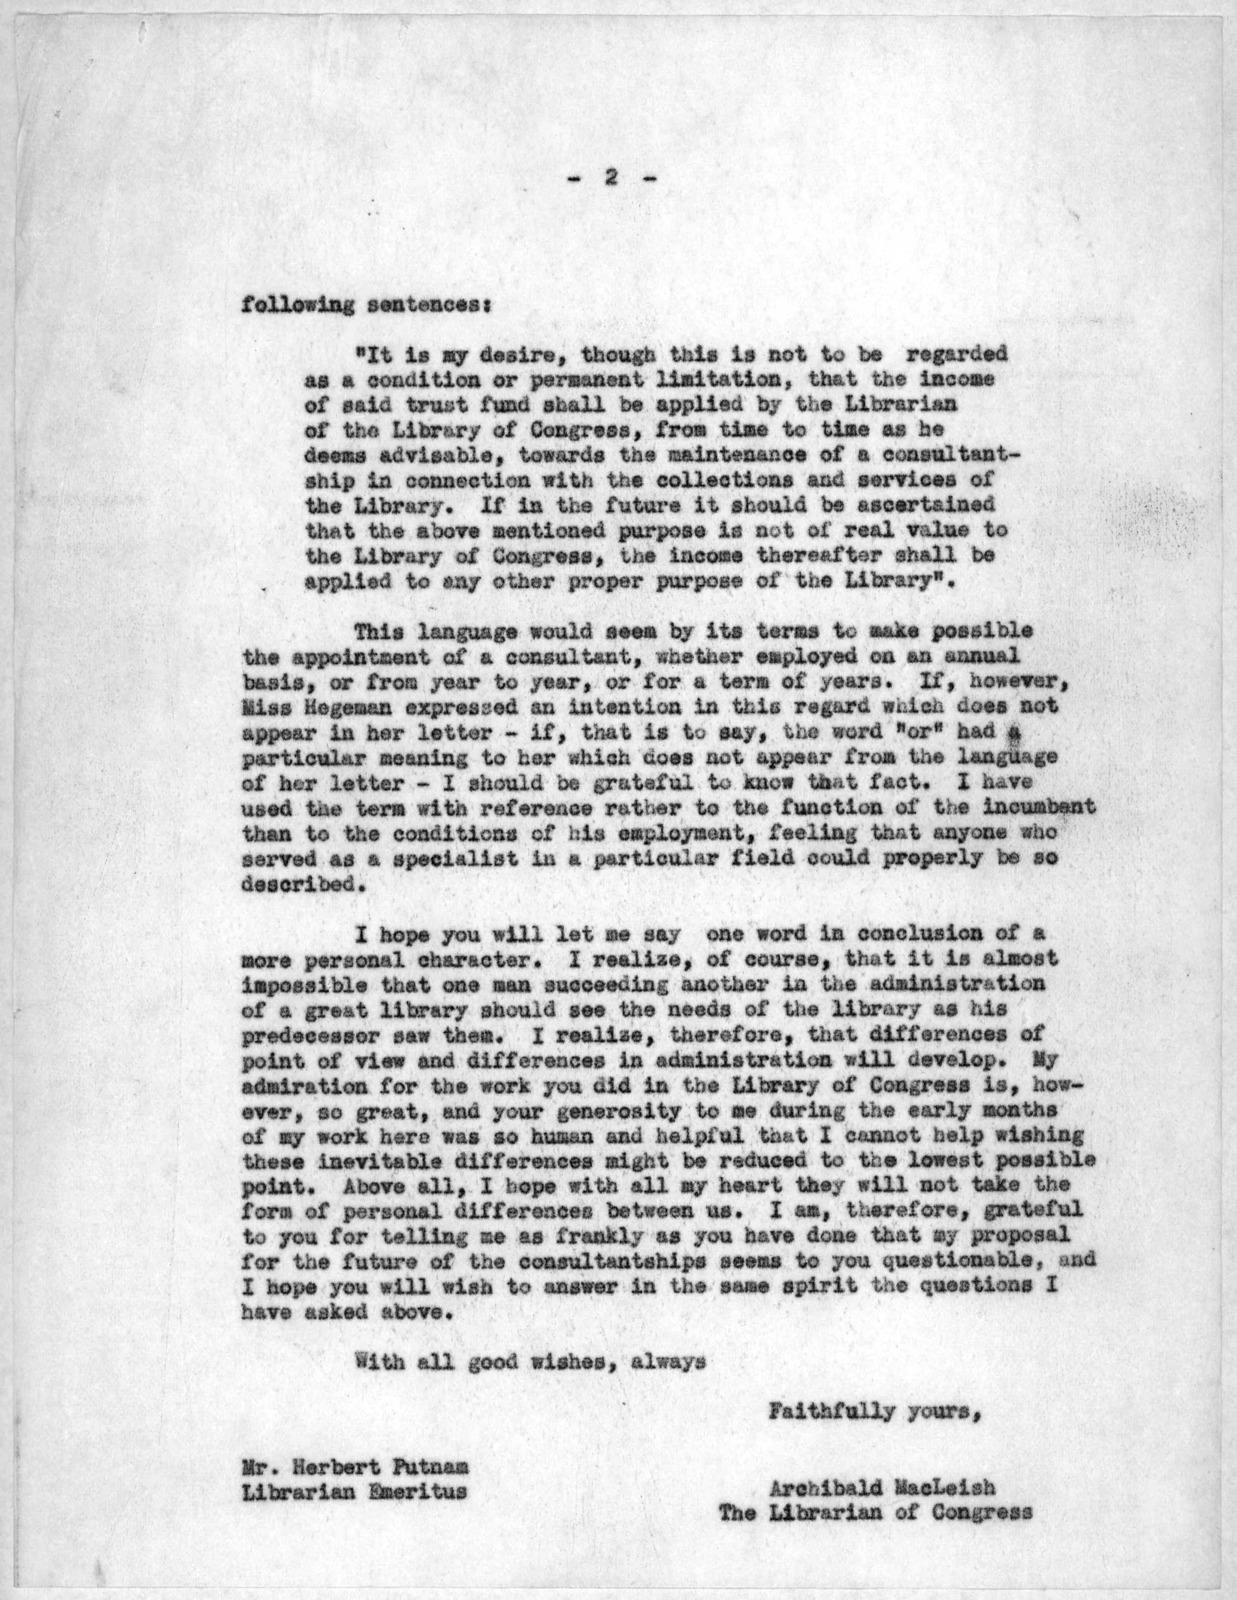 Letter from Archibald MacLeish to Herbert Putnam, June 3, 1941